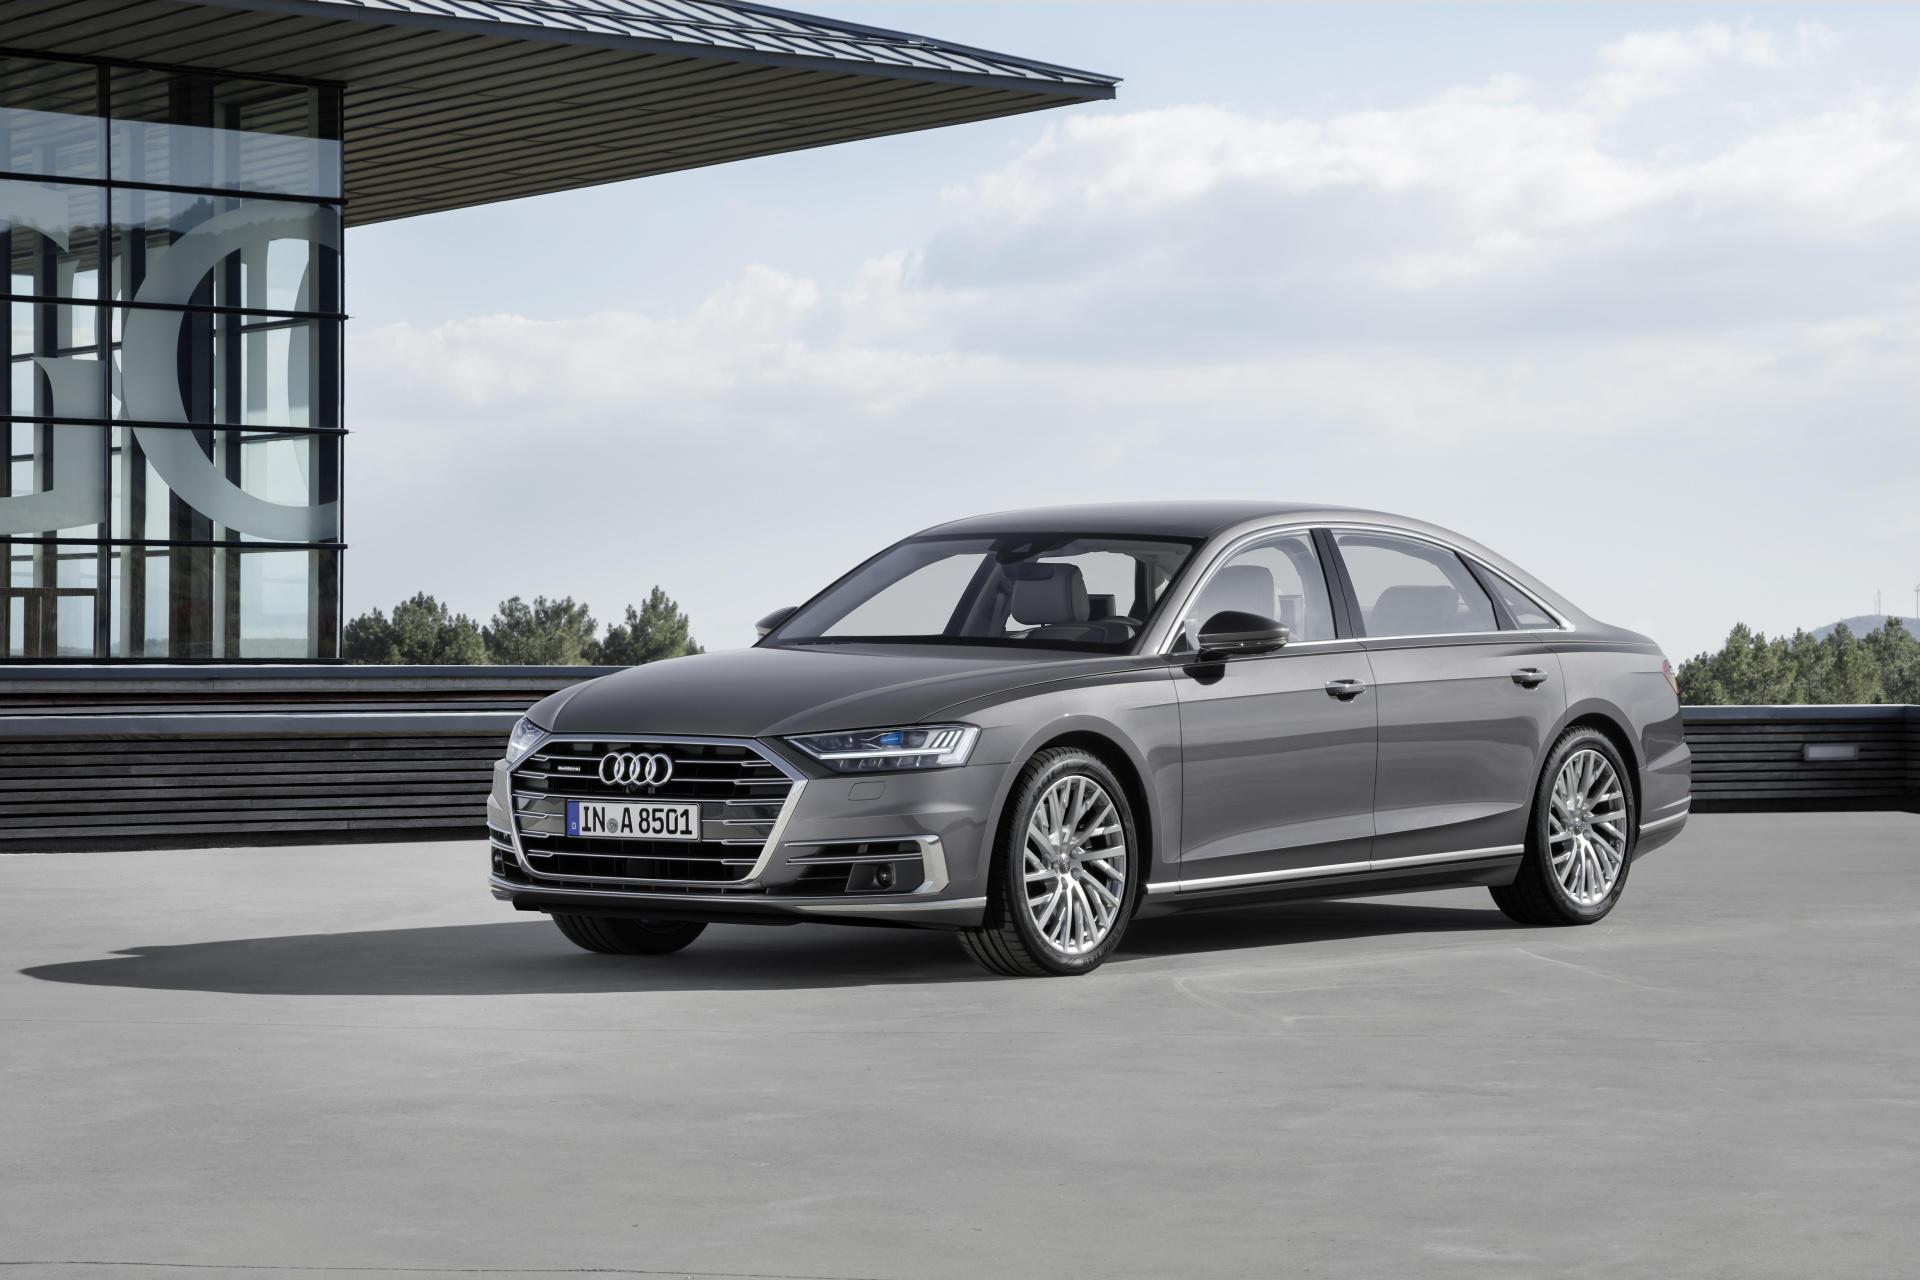 Audi A8 50 Tdi 286 Quattro Aut. 8v